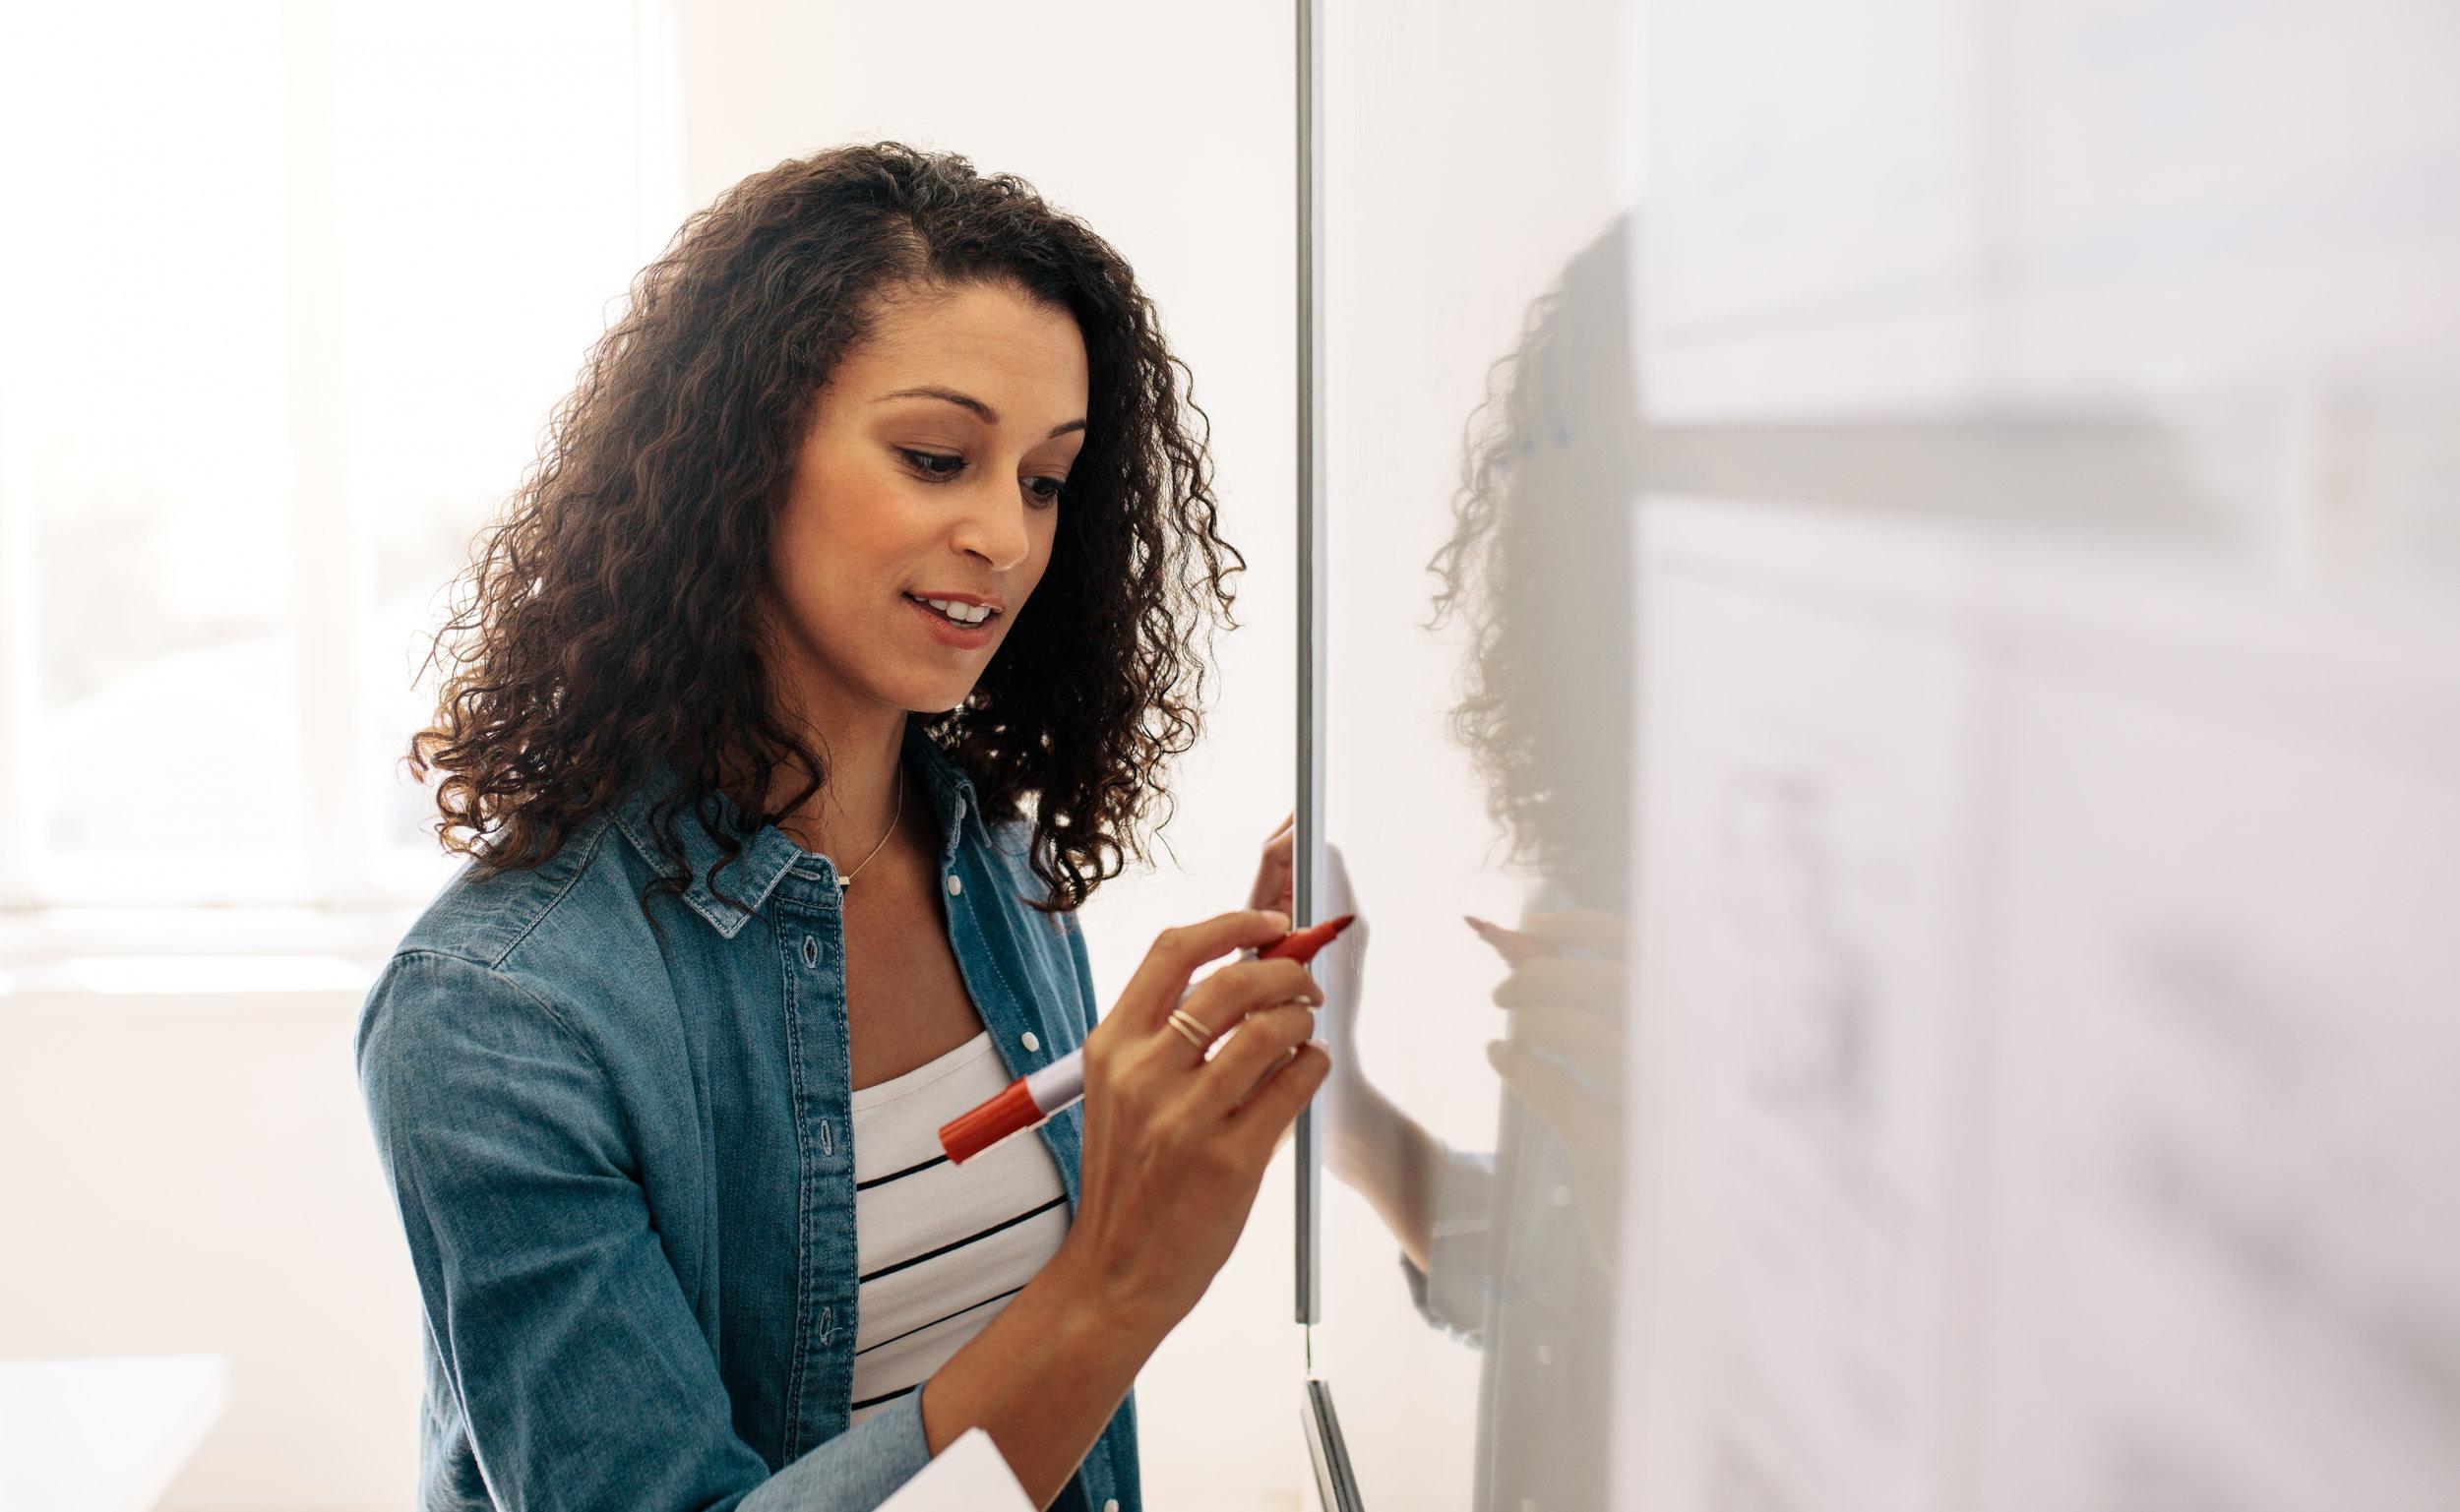 Canva - Businesswoman Writing on Whiteboard in Office.jpg